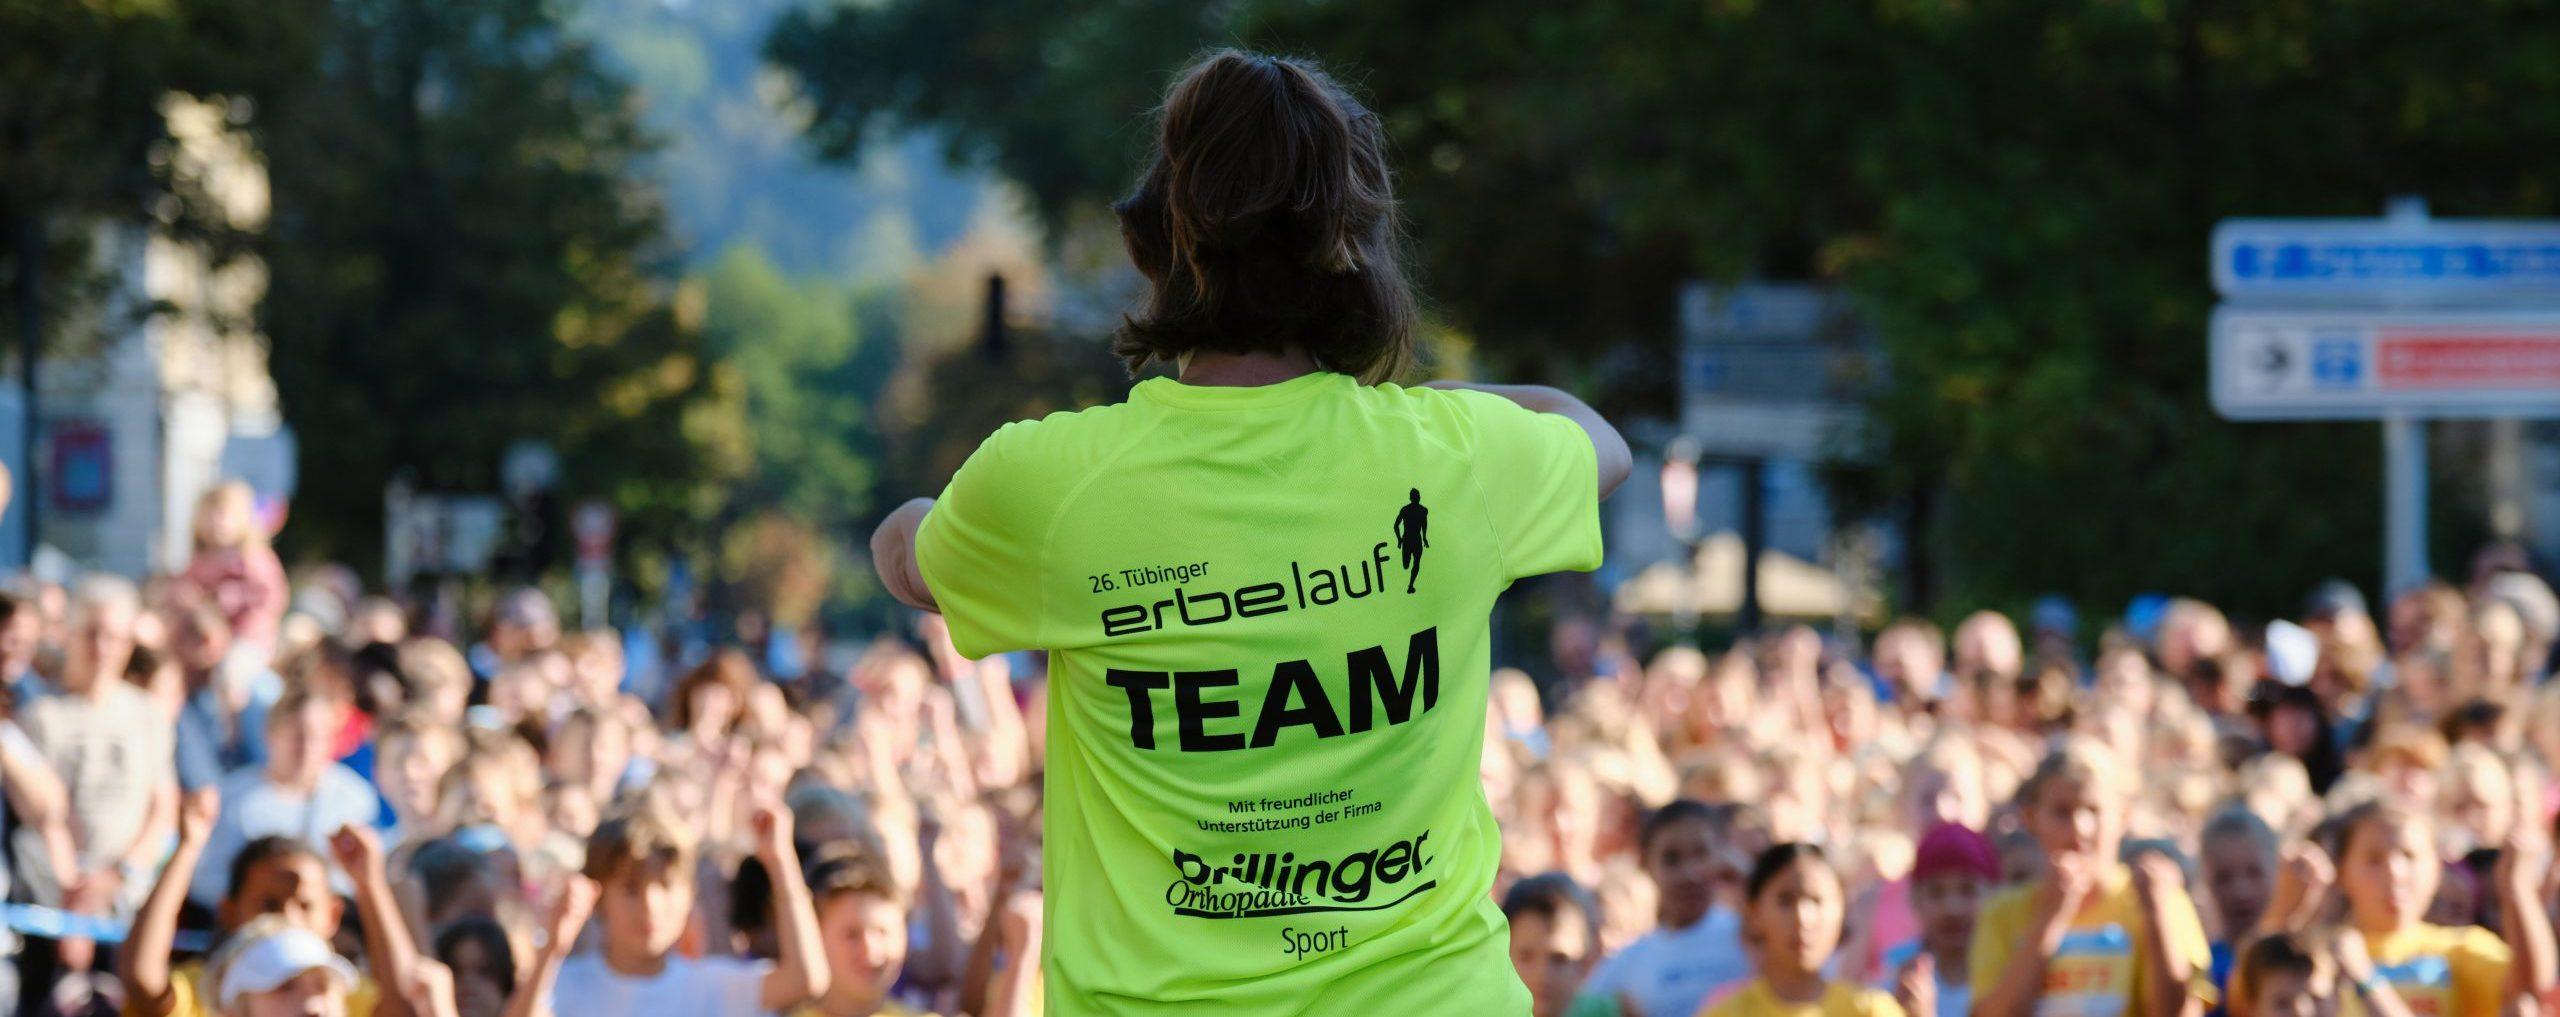 Erbe-Lauf #backontheroad mit Top-Starterfeld